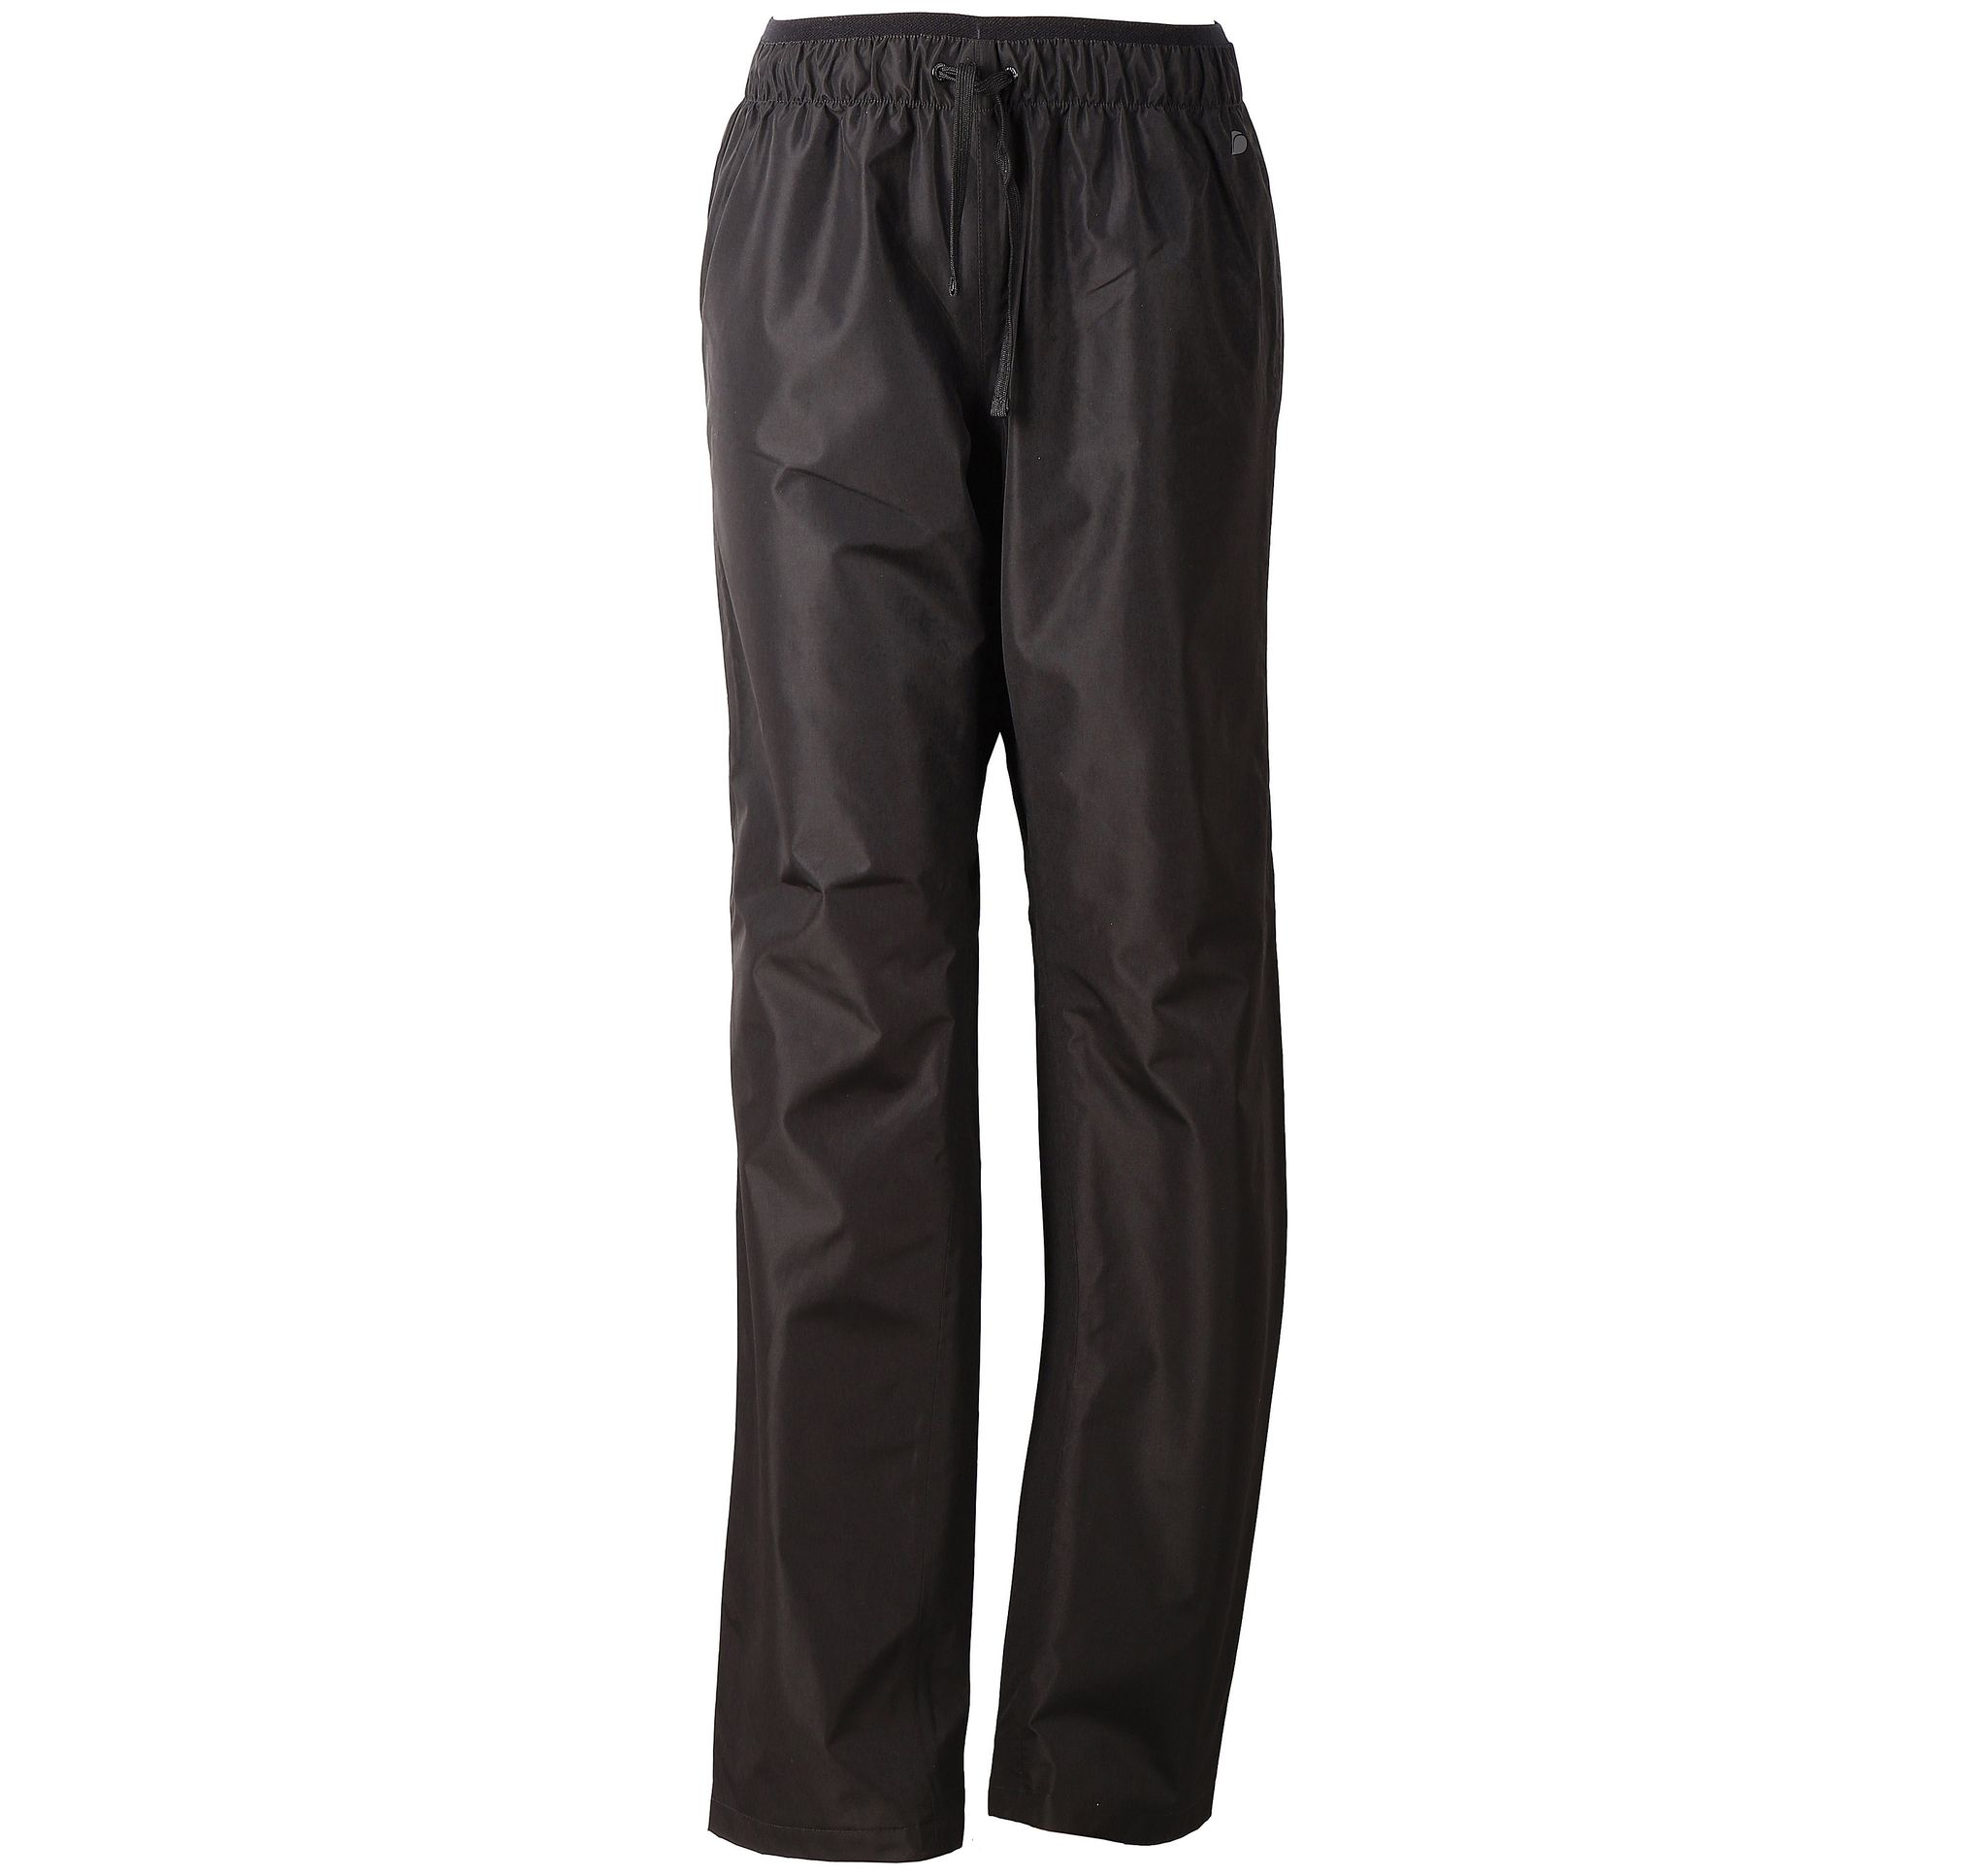 cumulus wns pants, black, 42, didriksons regnkläder